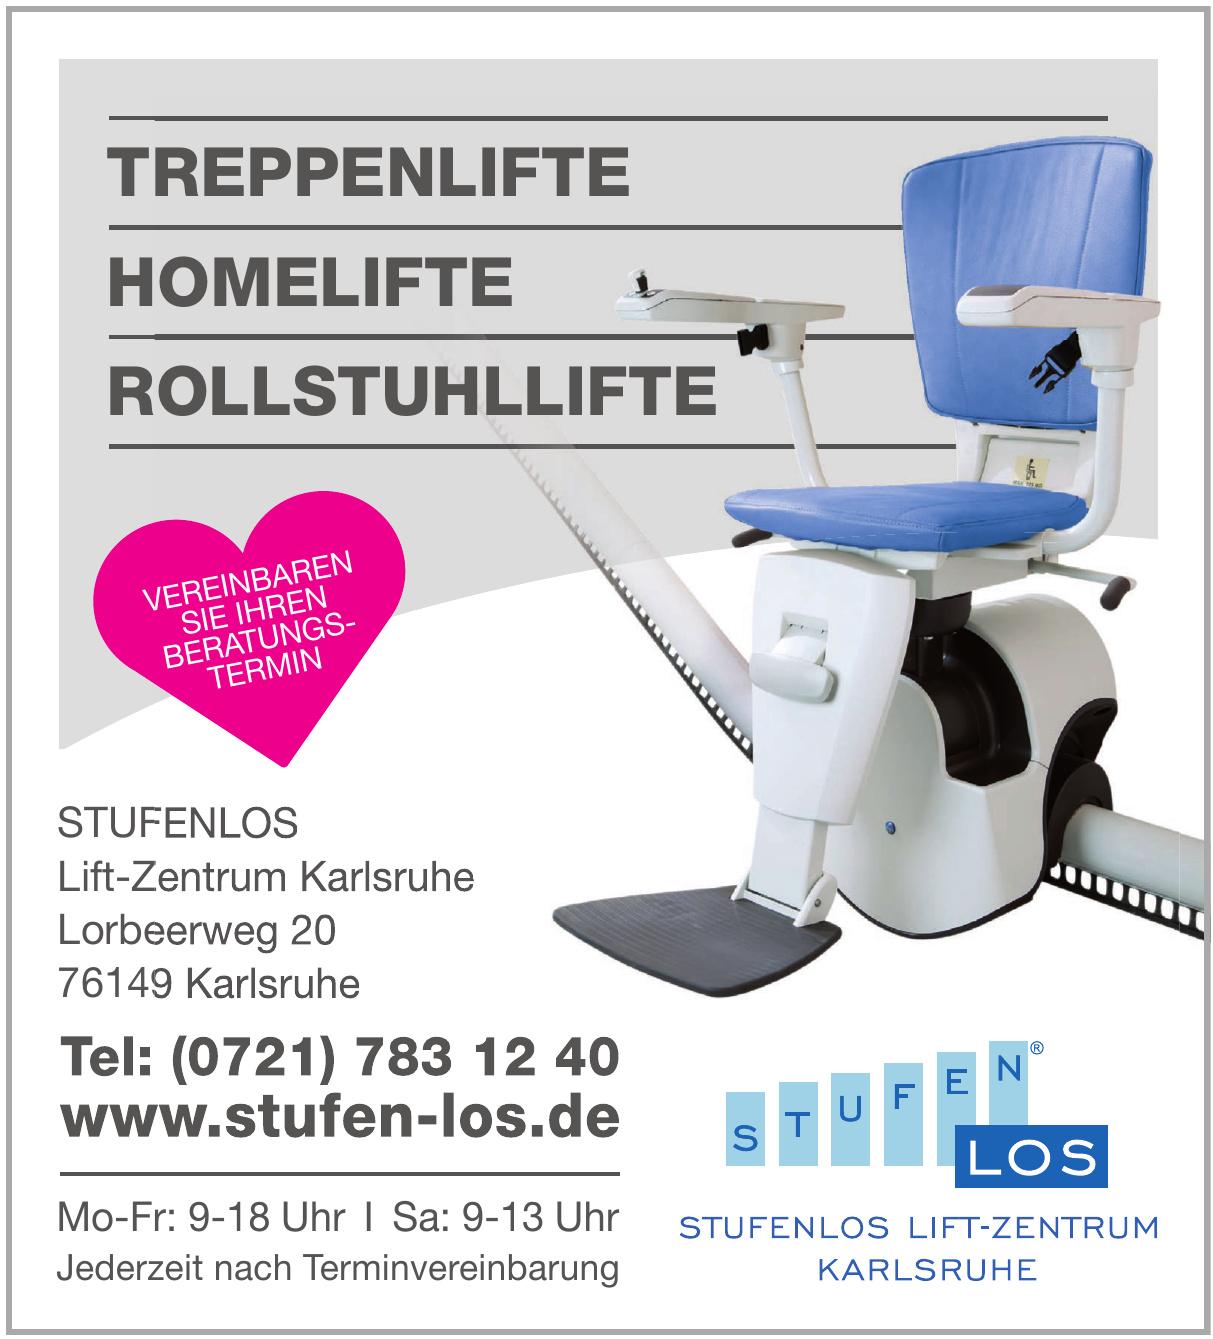 Stufenlos Lift-Zentrum Karlsruhe